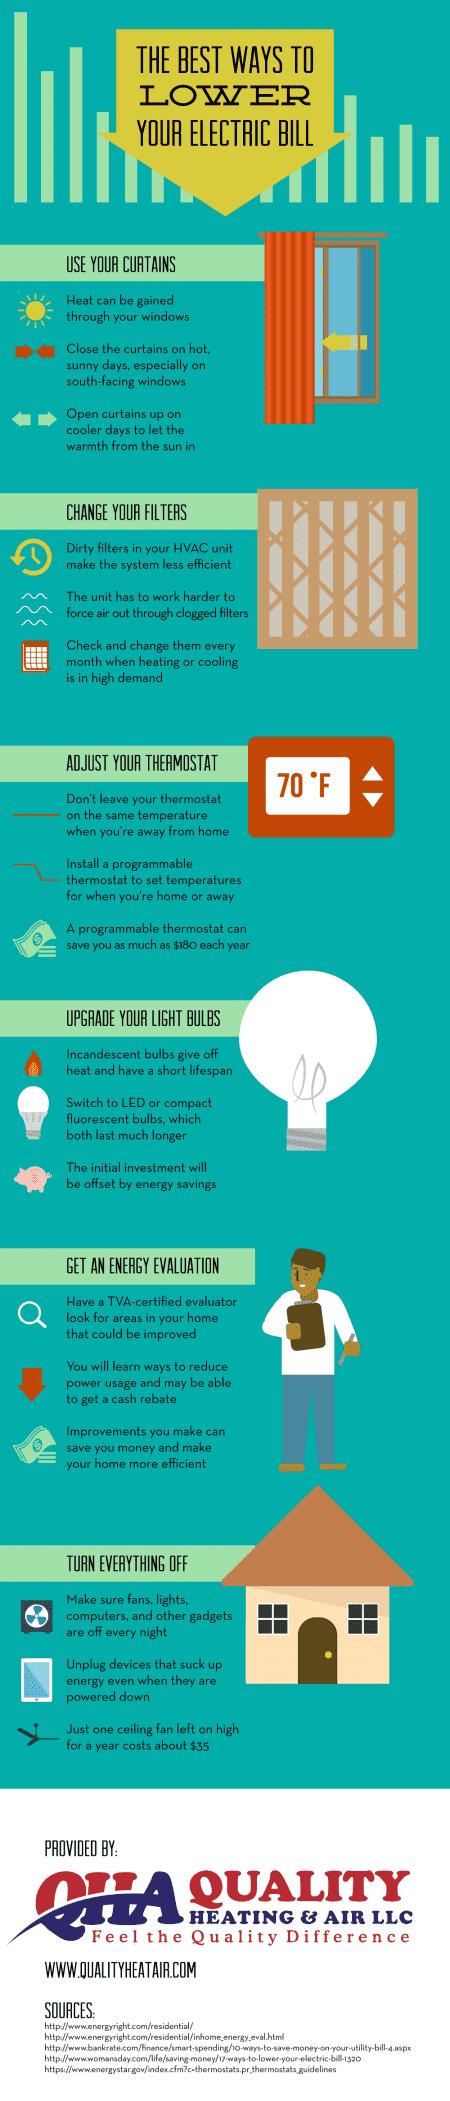 Ways to lower your electric bill in Murfreesboro, TN